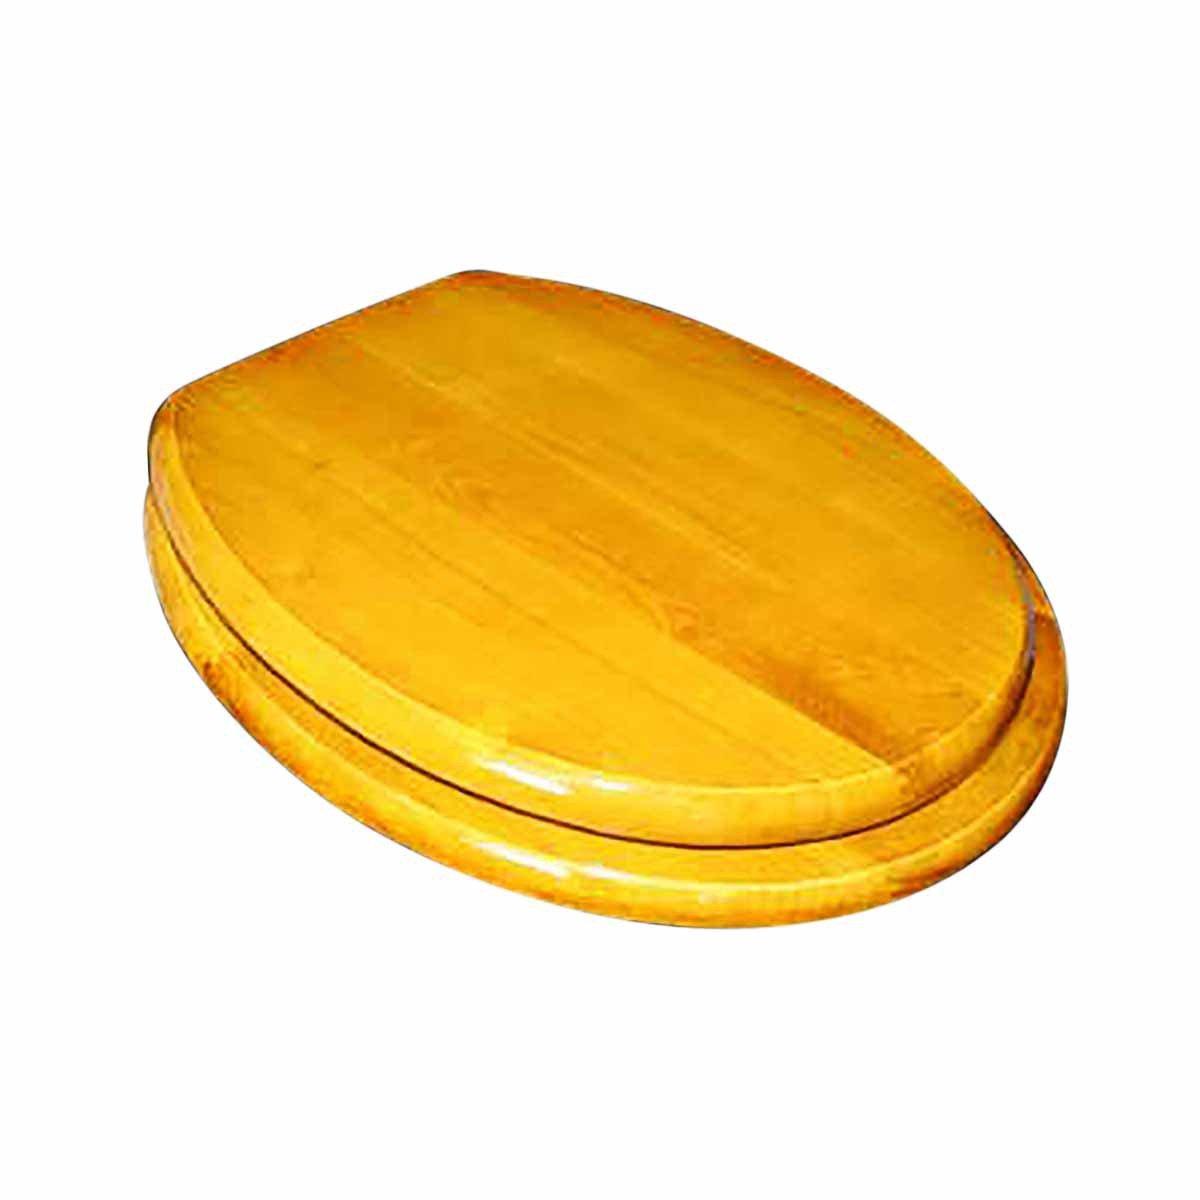 well-wreapped Bathroom Toilet Seat Golden Amber Hardwood Elong Chrome | Renovator's Supply